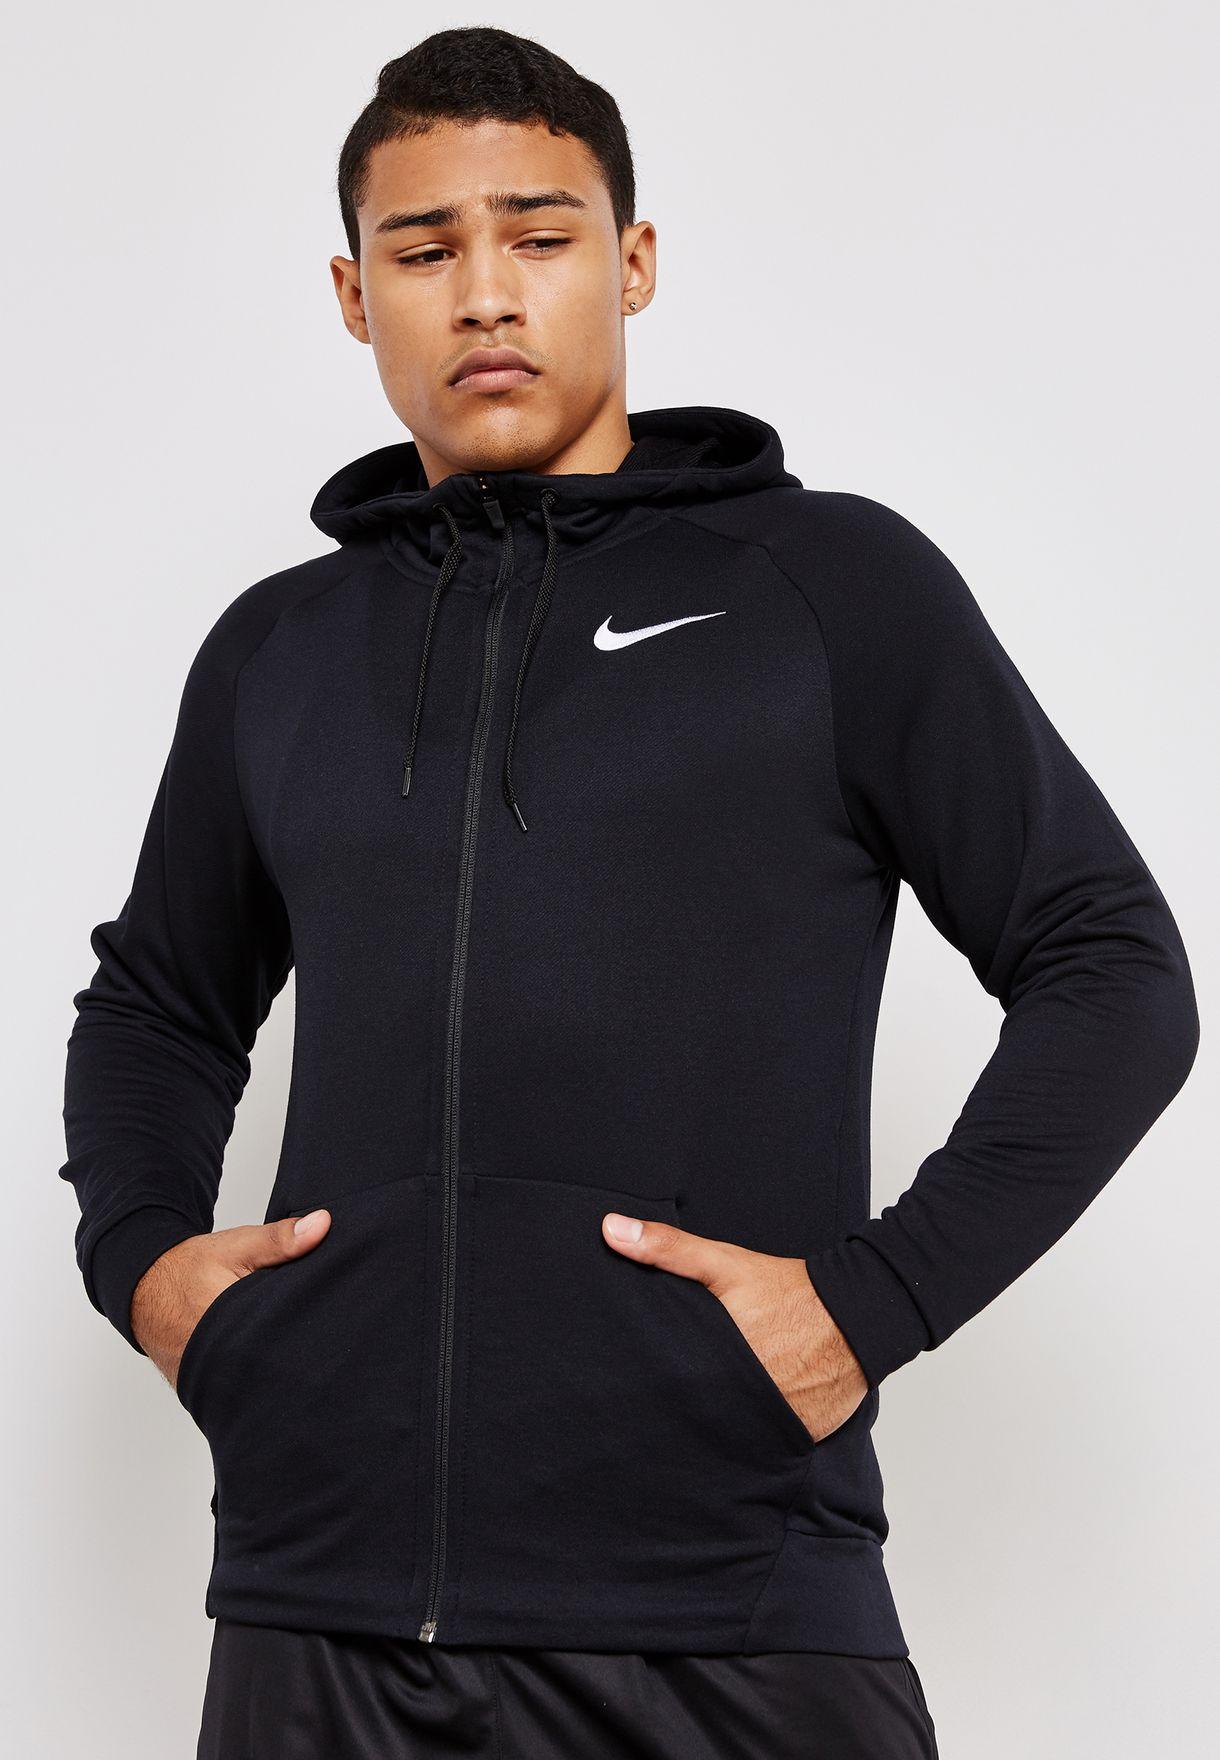 303fc813 Shop Nike black Dri-FIT Fleece Hoodie 860465-010 for Men in UAE ...